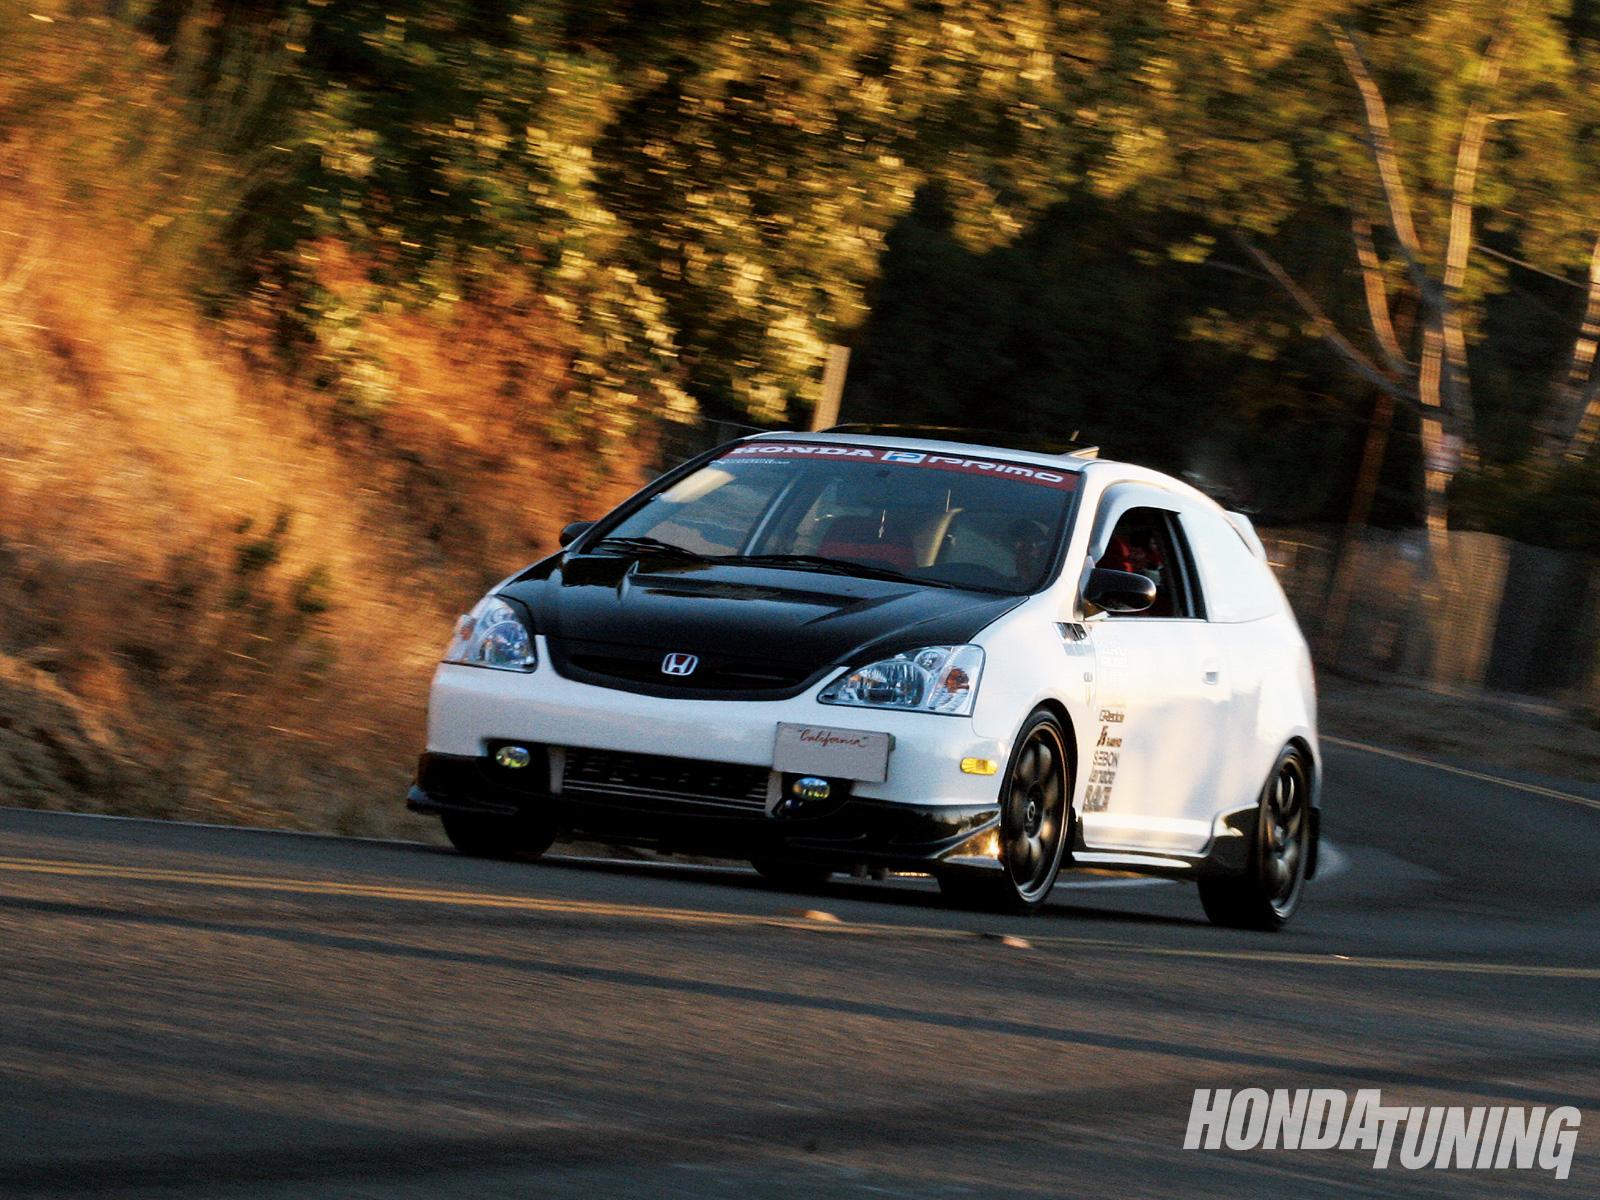 2003 Honda Civic Si Hatchback - GReddy Turbo Kit - Honda Tuning Magazine